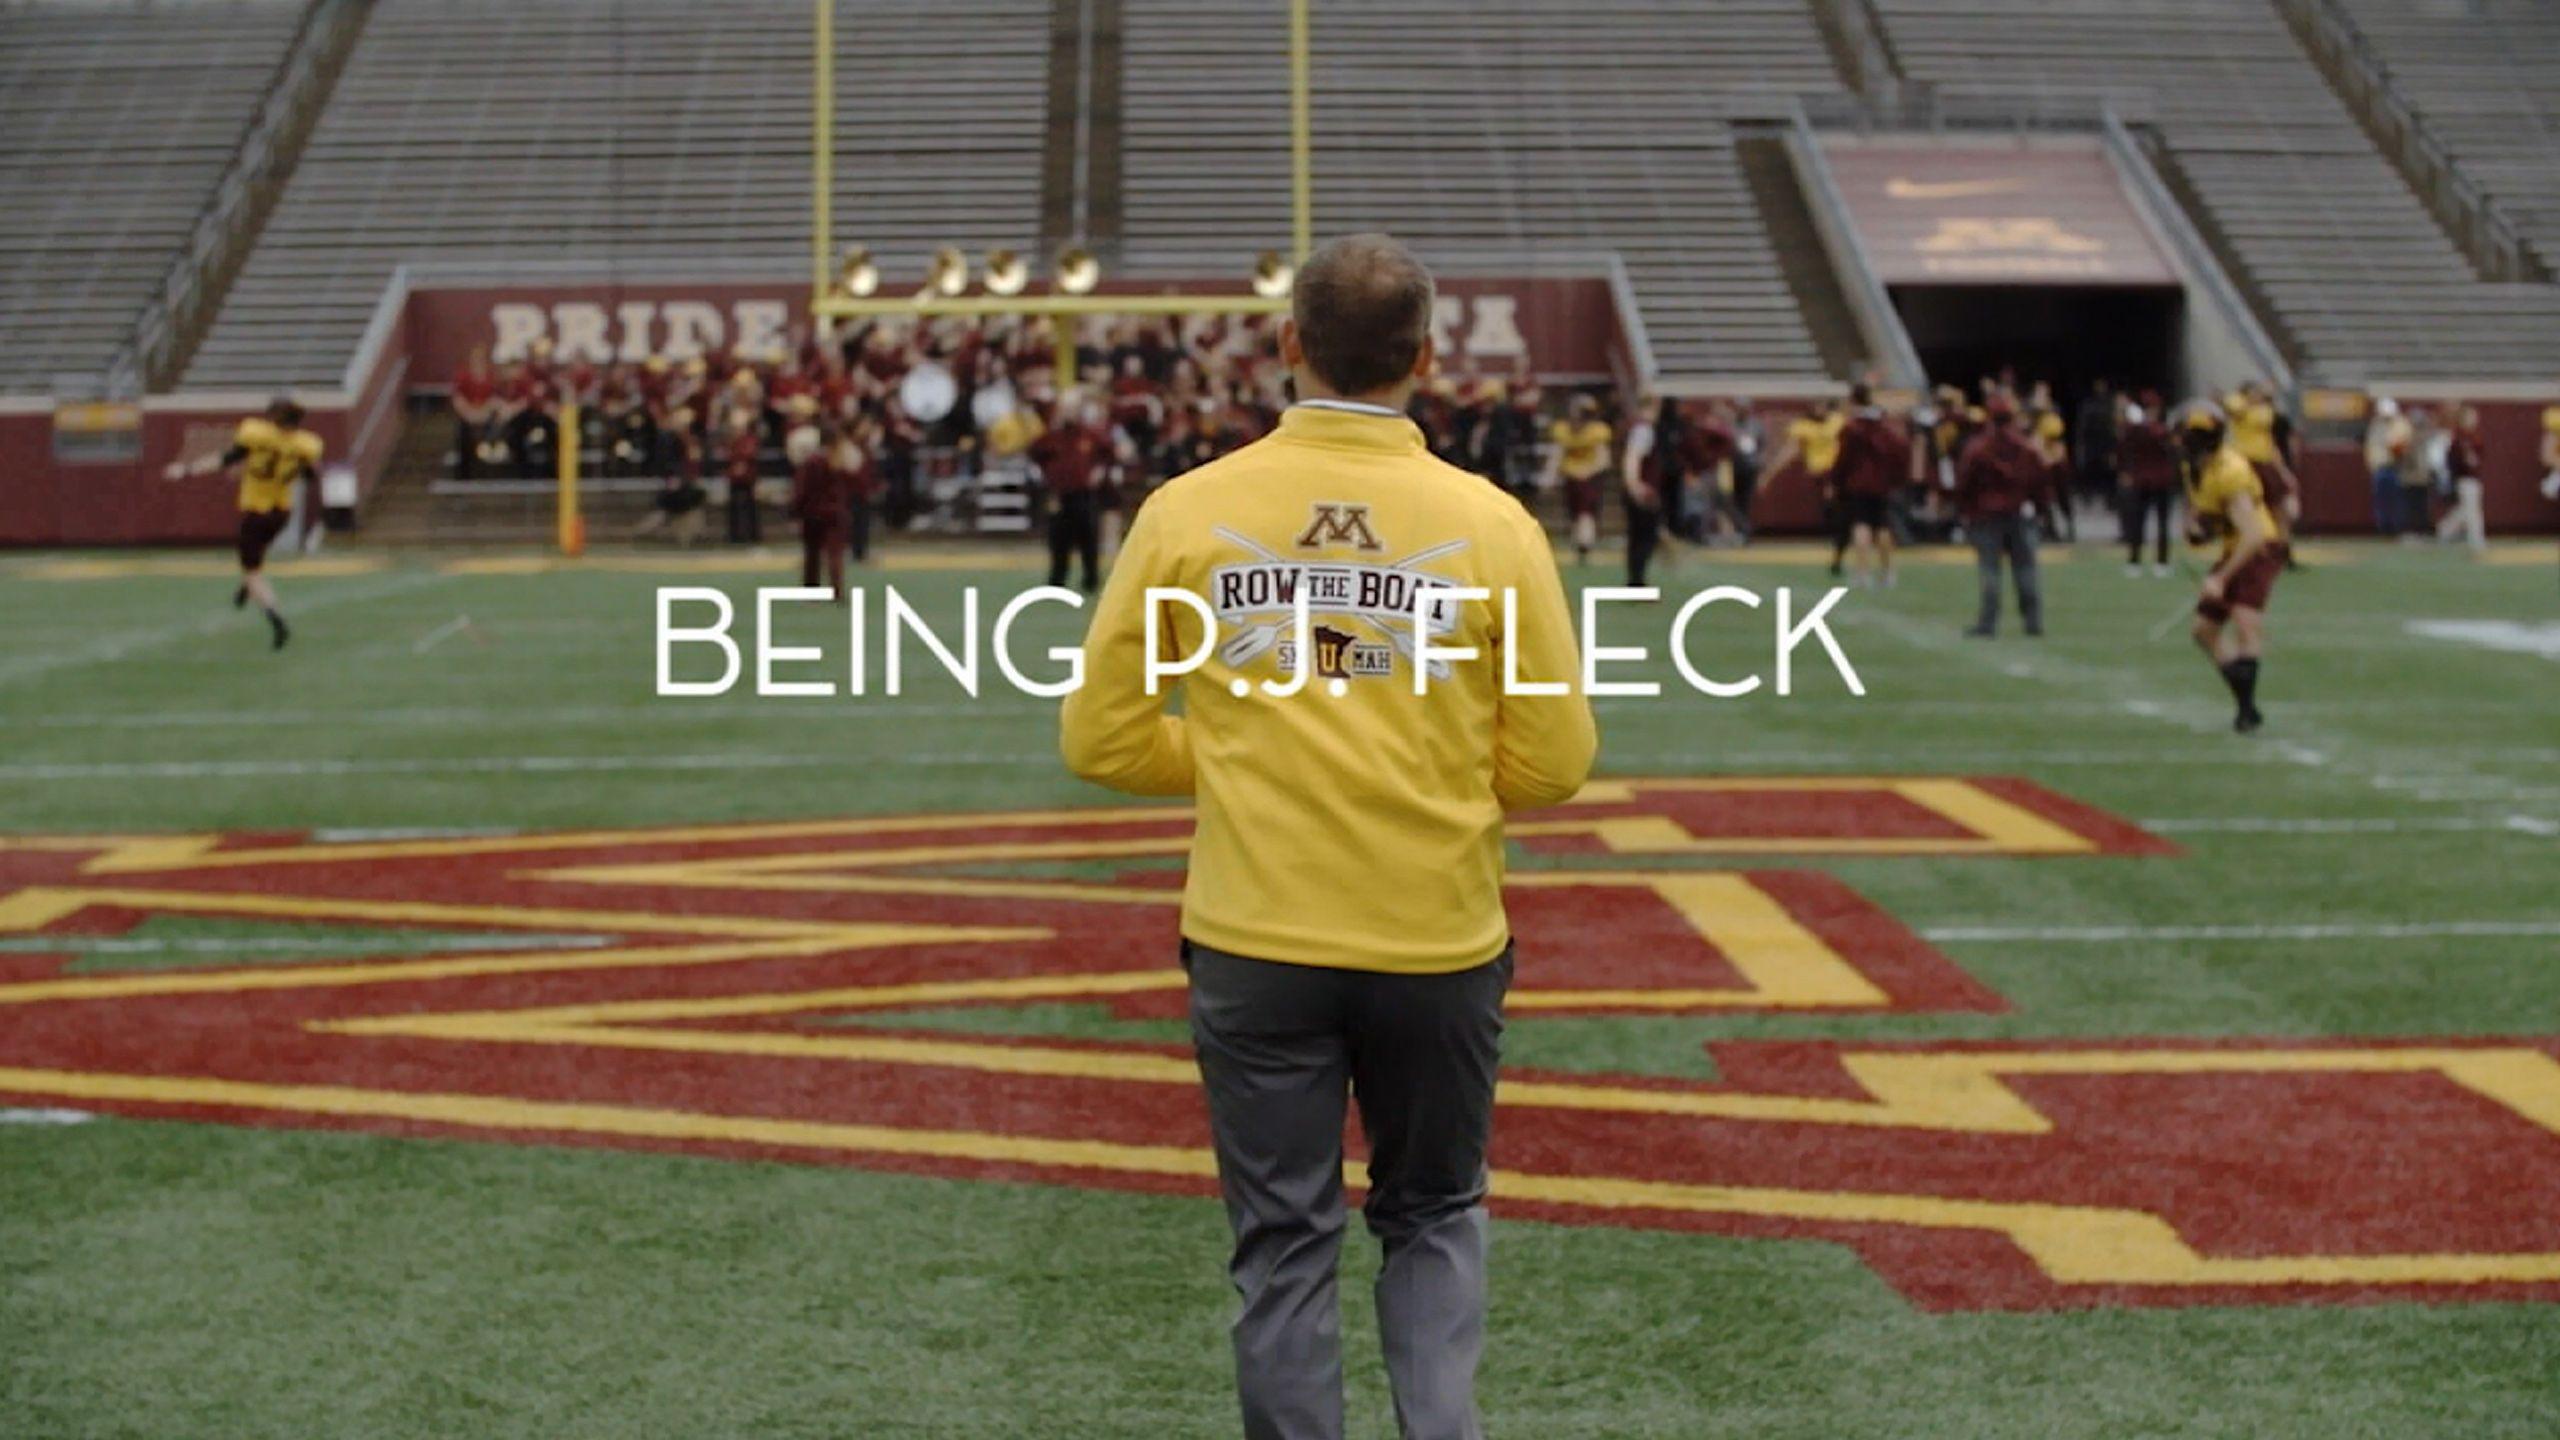 BEING P.J. Fleck: Sleeping Giant